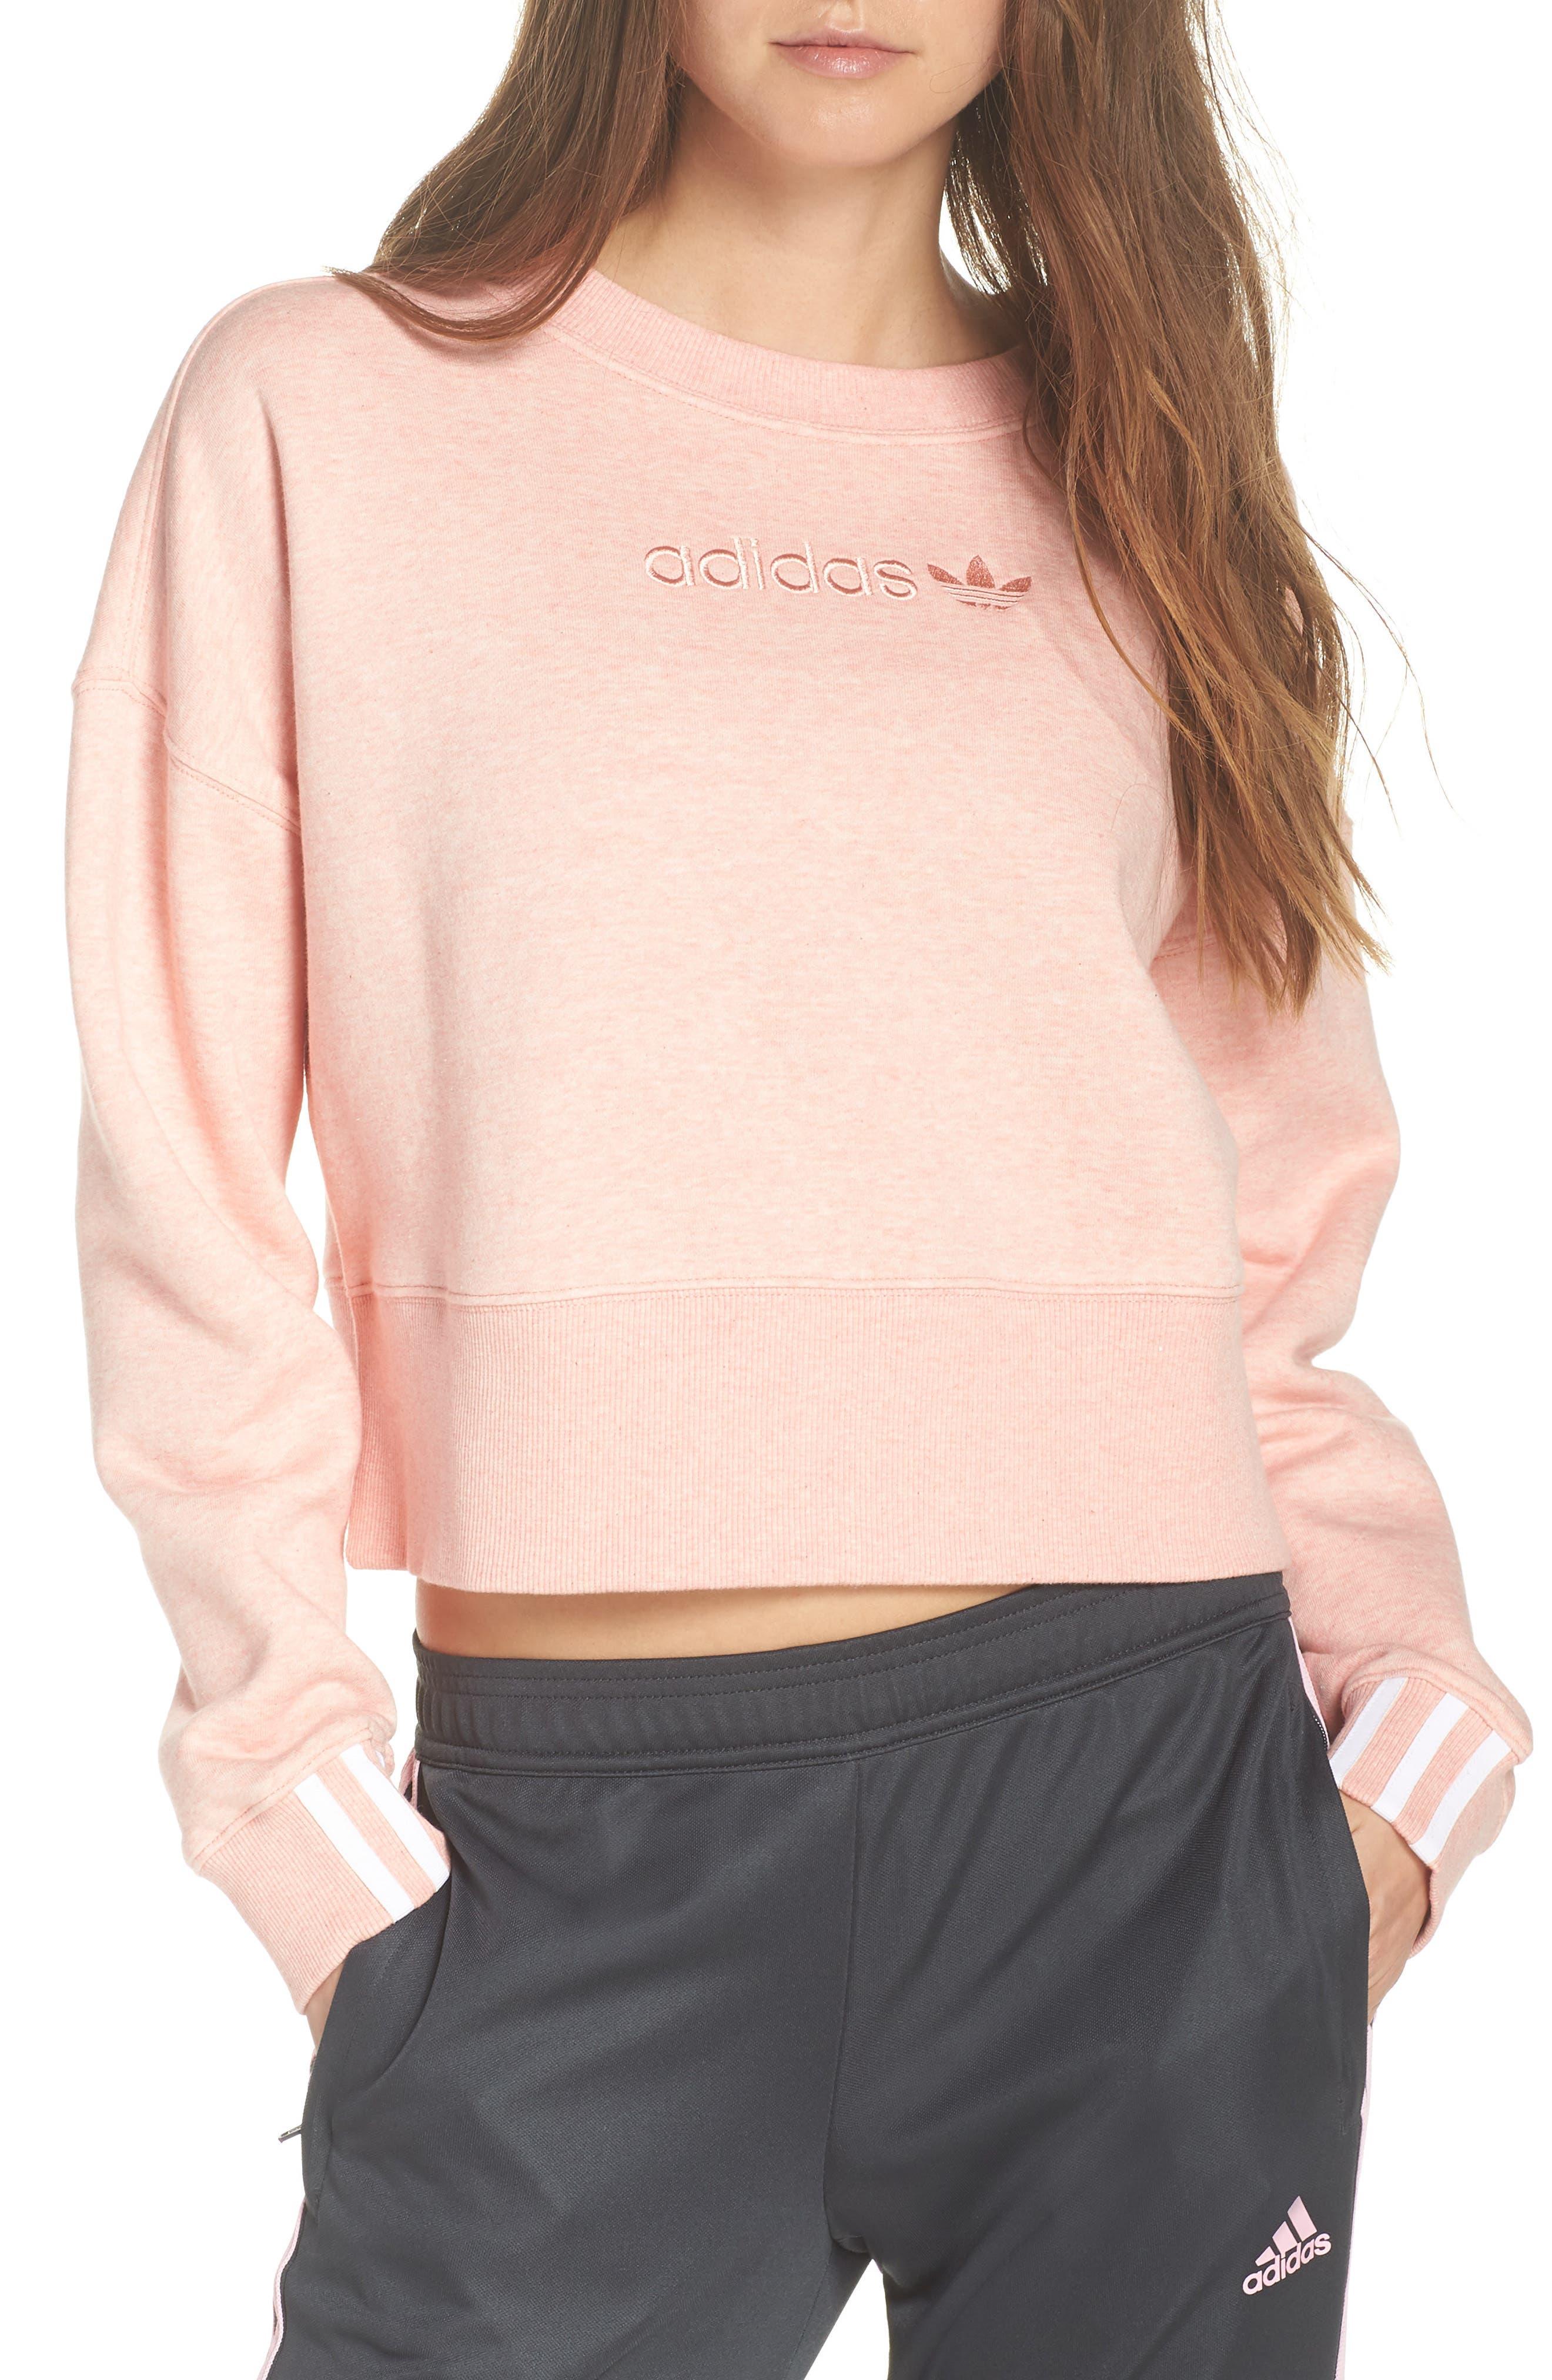 ADIDAS ORIGINALS, adidas Coeeze Crop Sweatshirt, Main thumbnail 1, color, 650